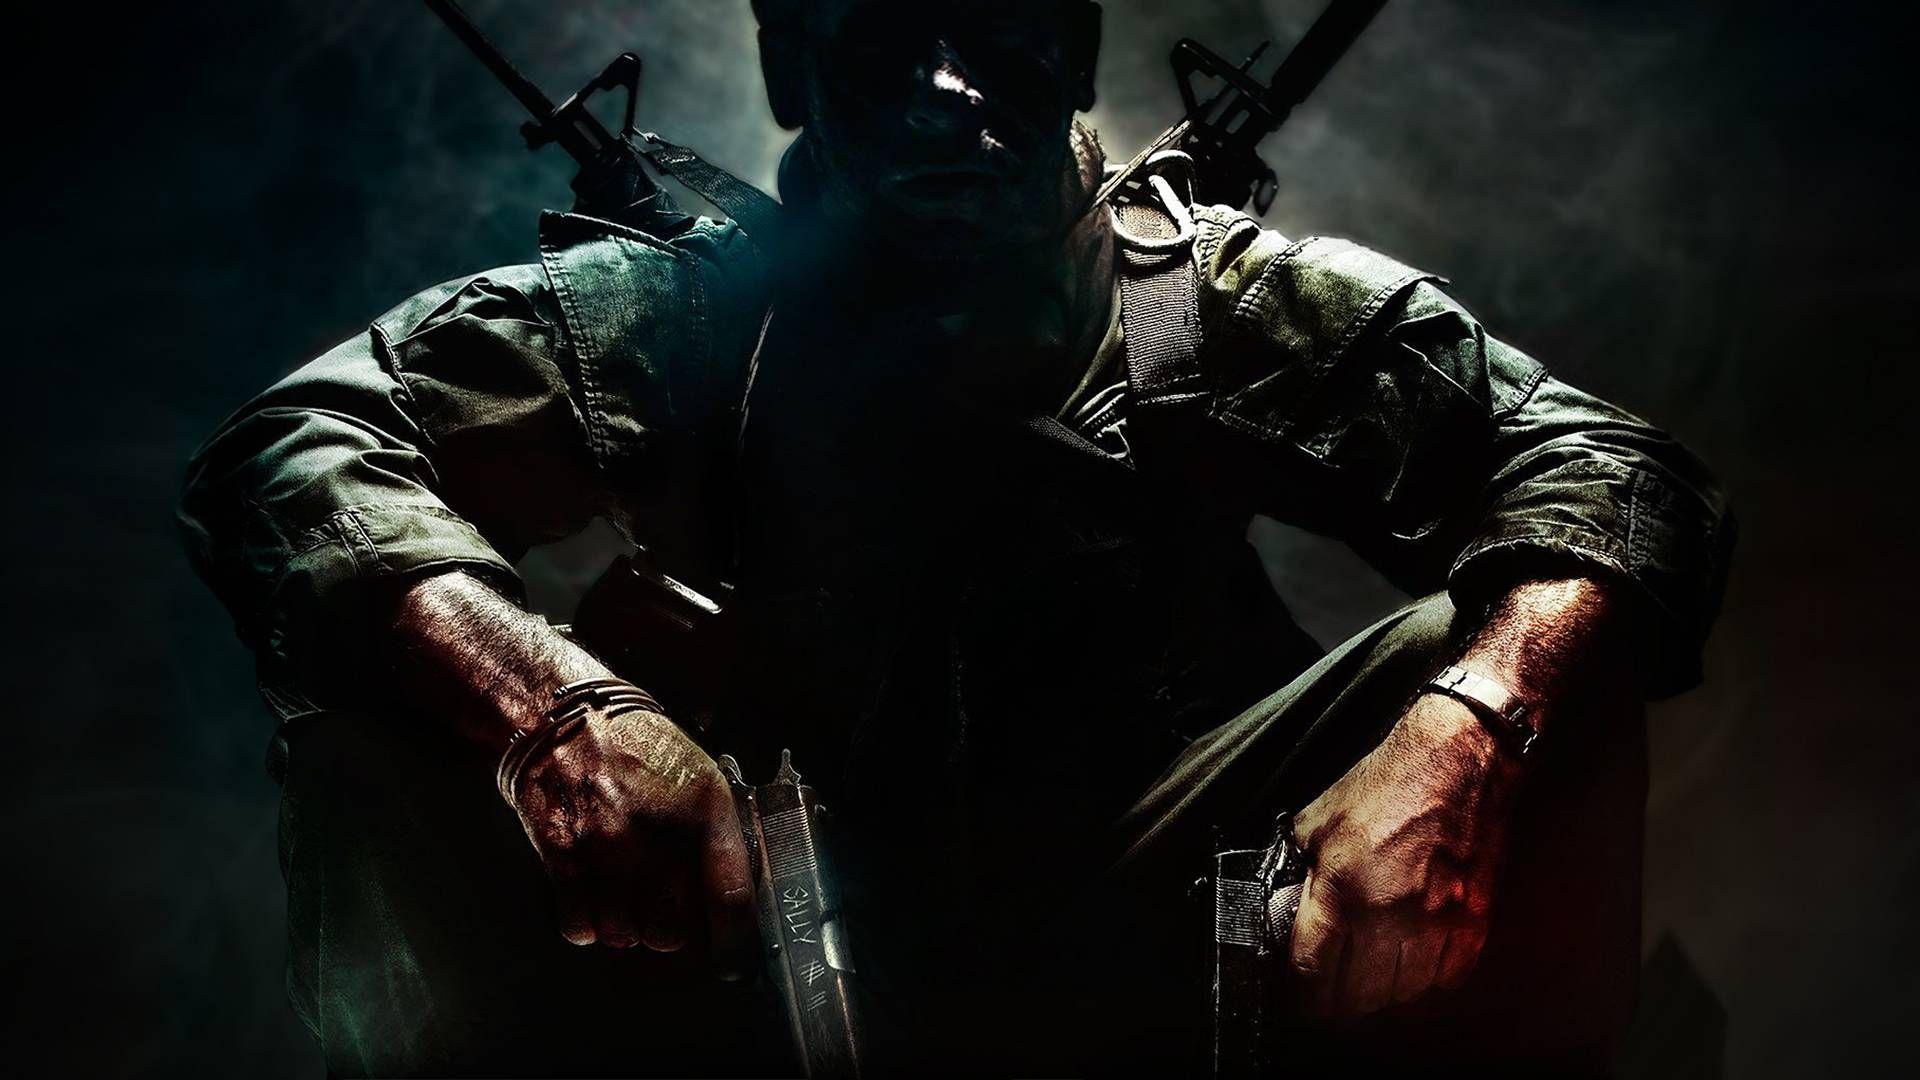 Fond D Ecran Hd Call Of Duty En 2019 Black Ops Black